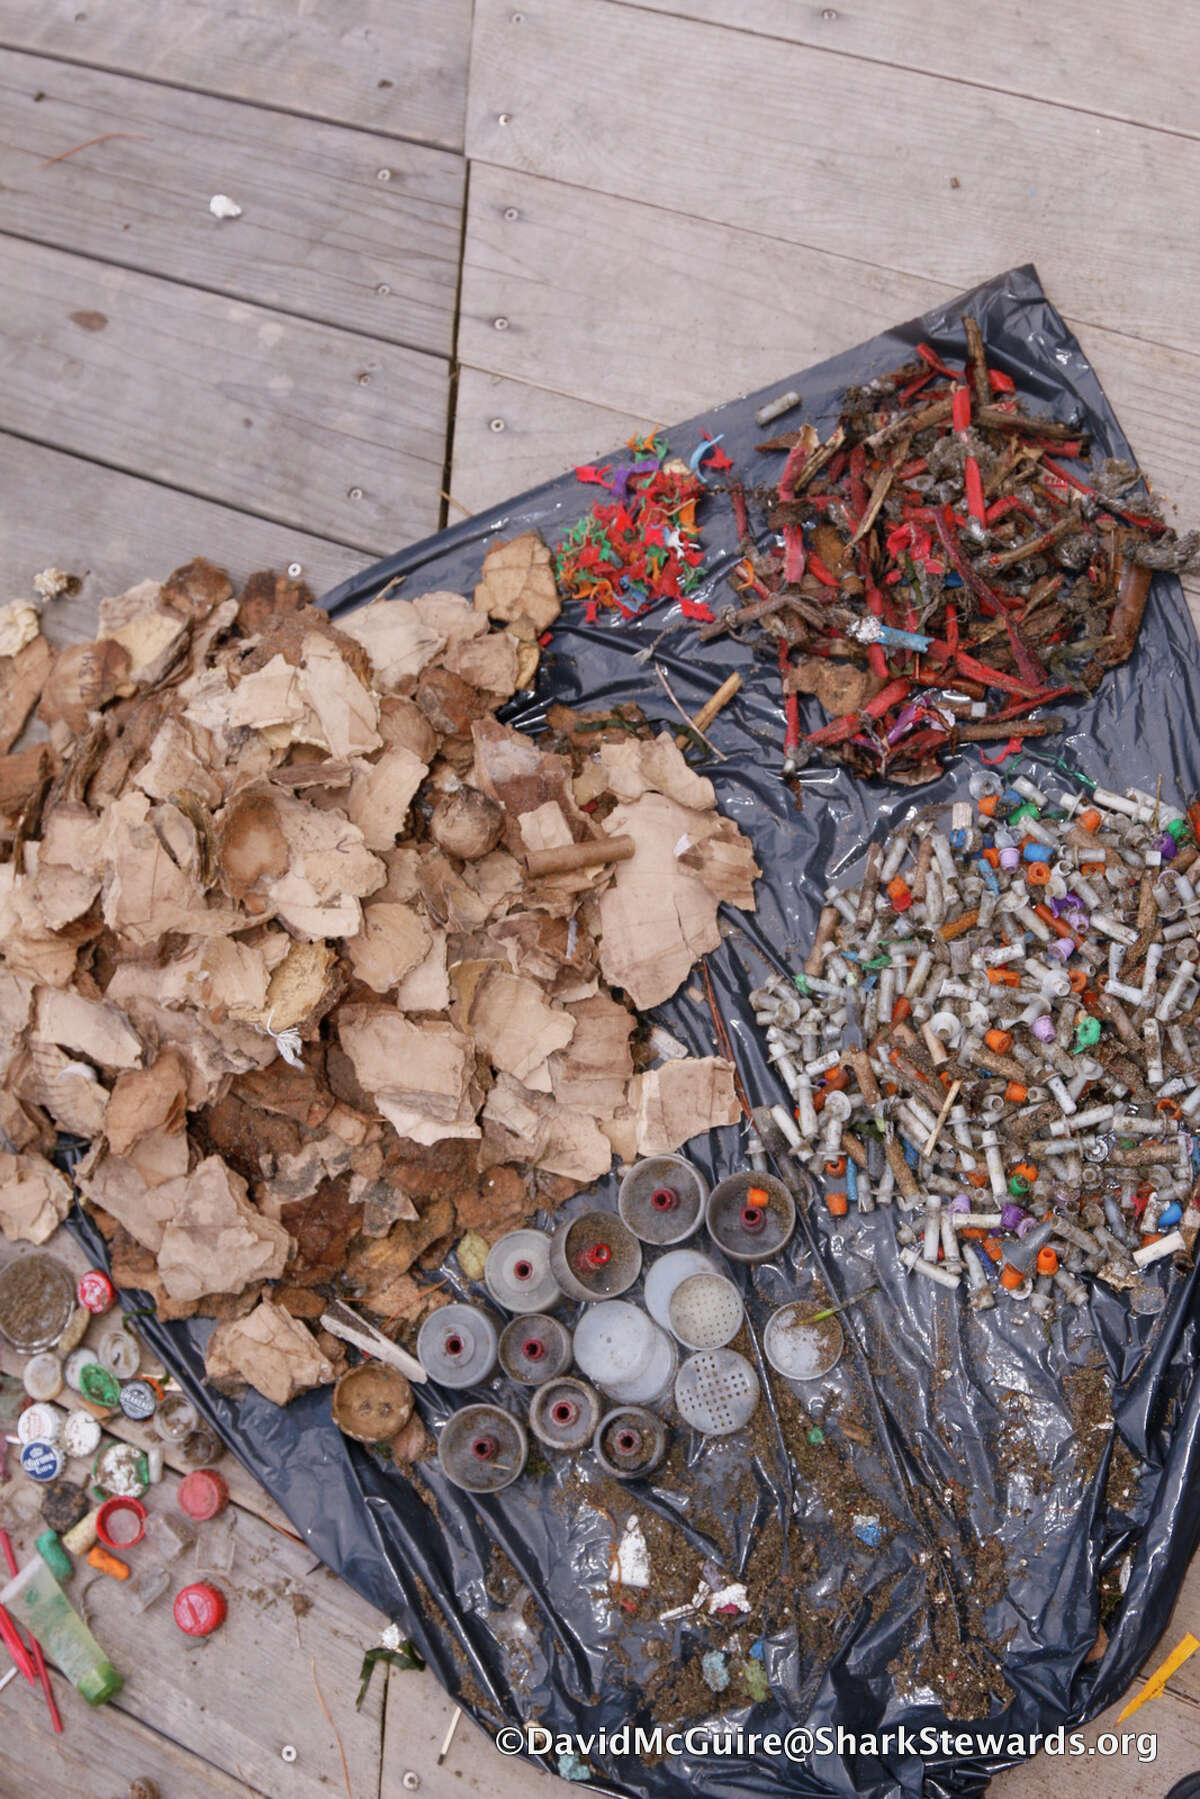 Volunteers picked up trash after Friday's Super Bowl fireworks show.